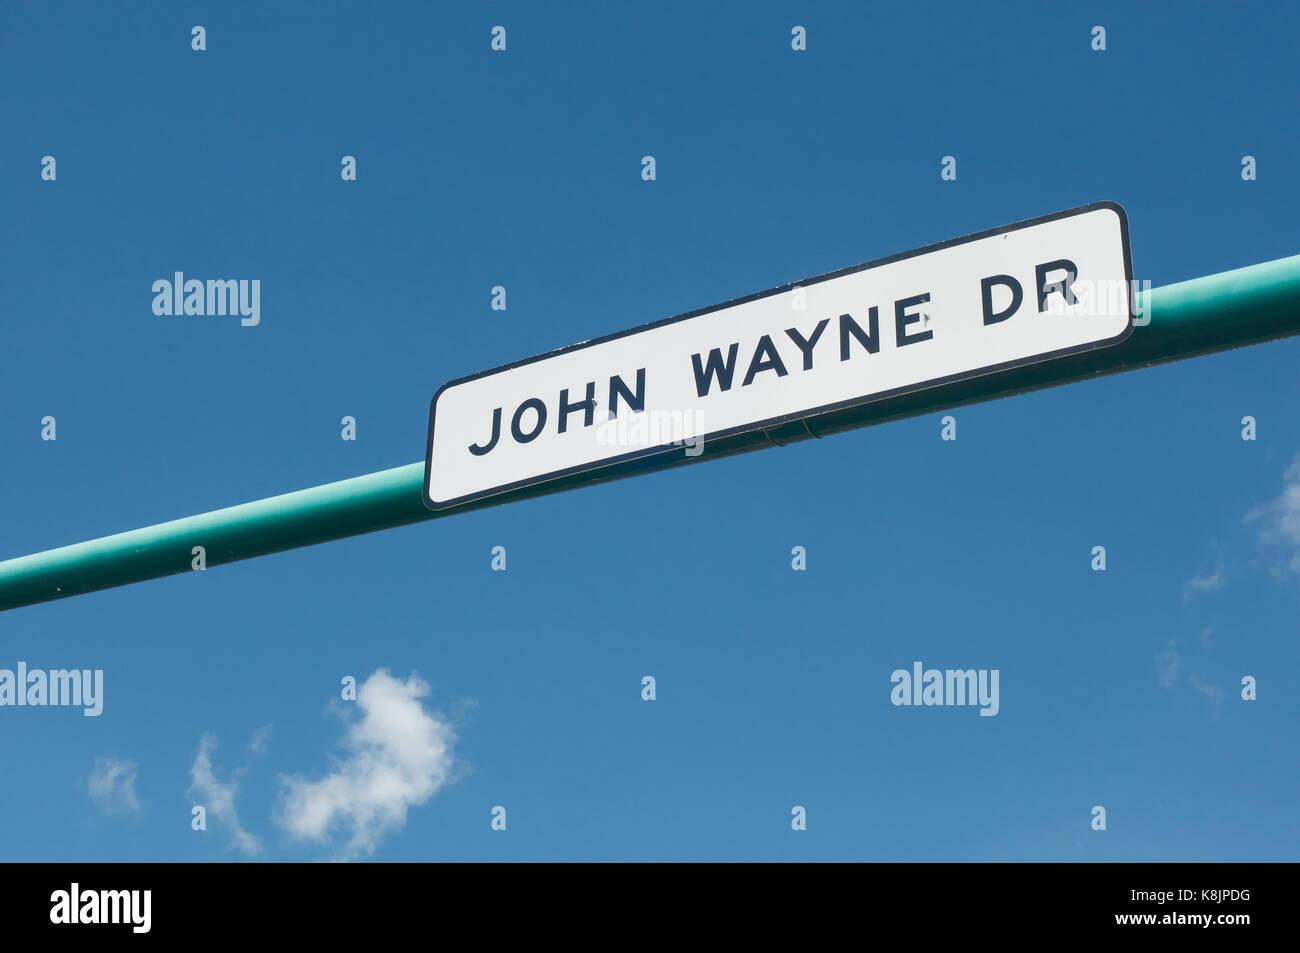 John Wayne Drive in Winterset, Madison County, Iowa - Stock Image